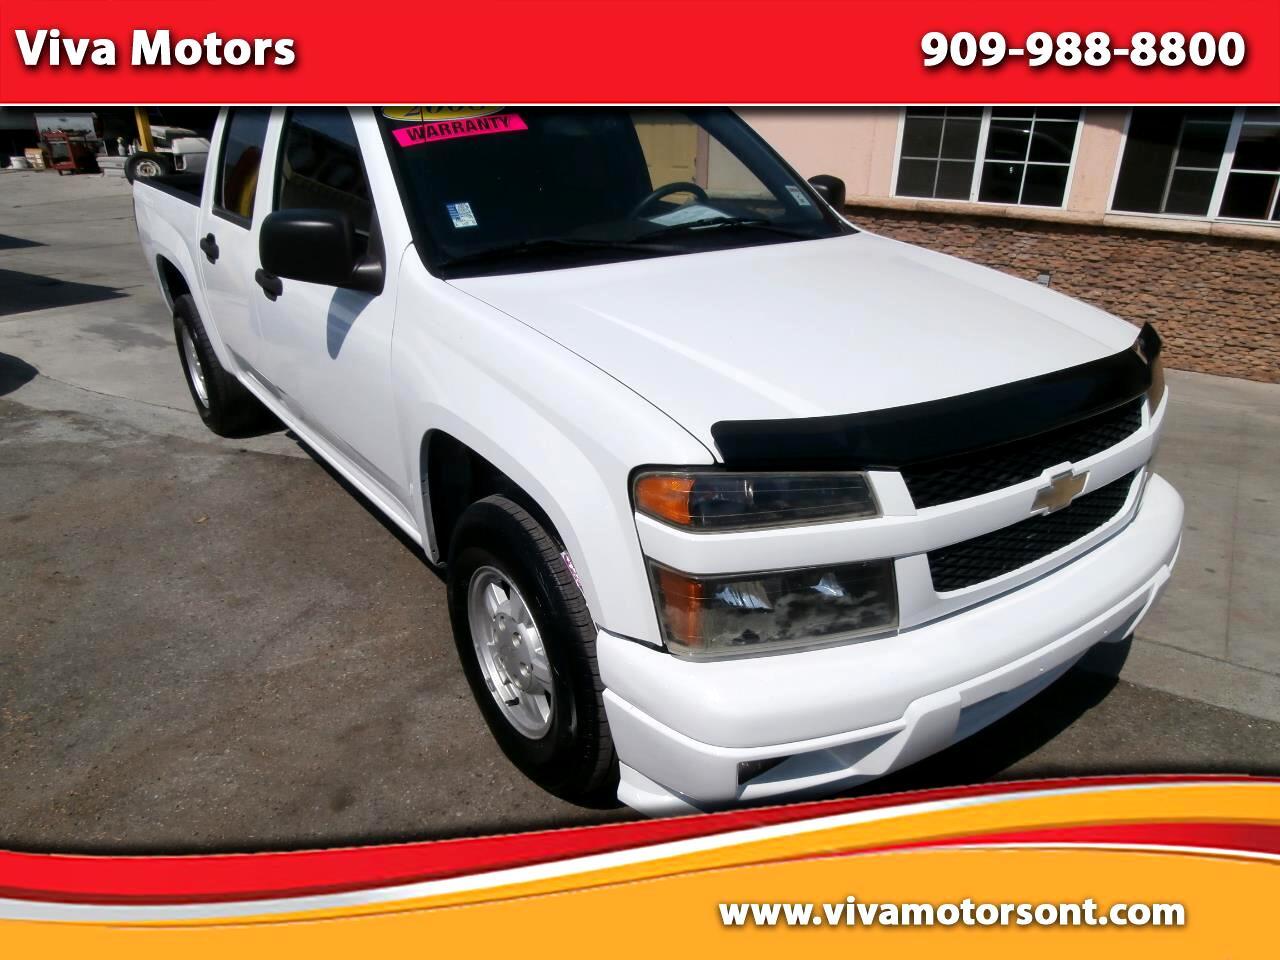 "Chevrolet Colorado 2WD Crew Cab 126.0"" LT w/1LT 2008"